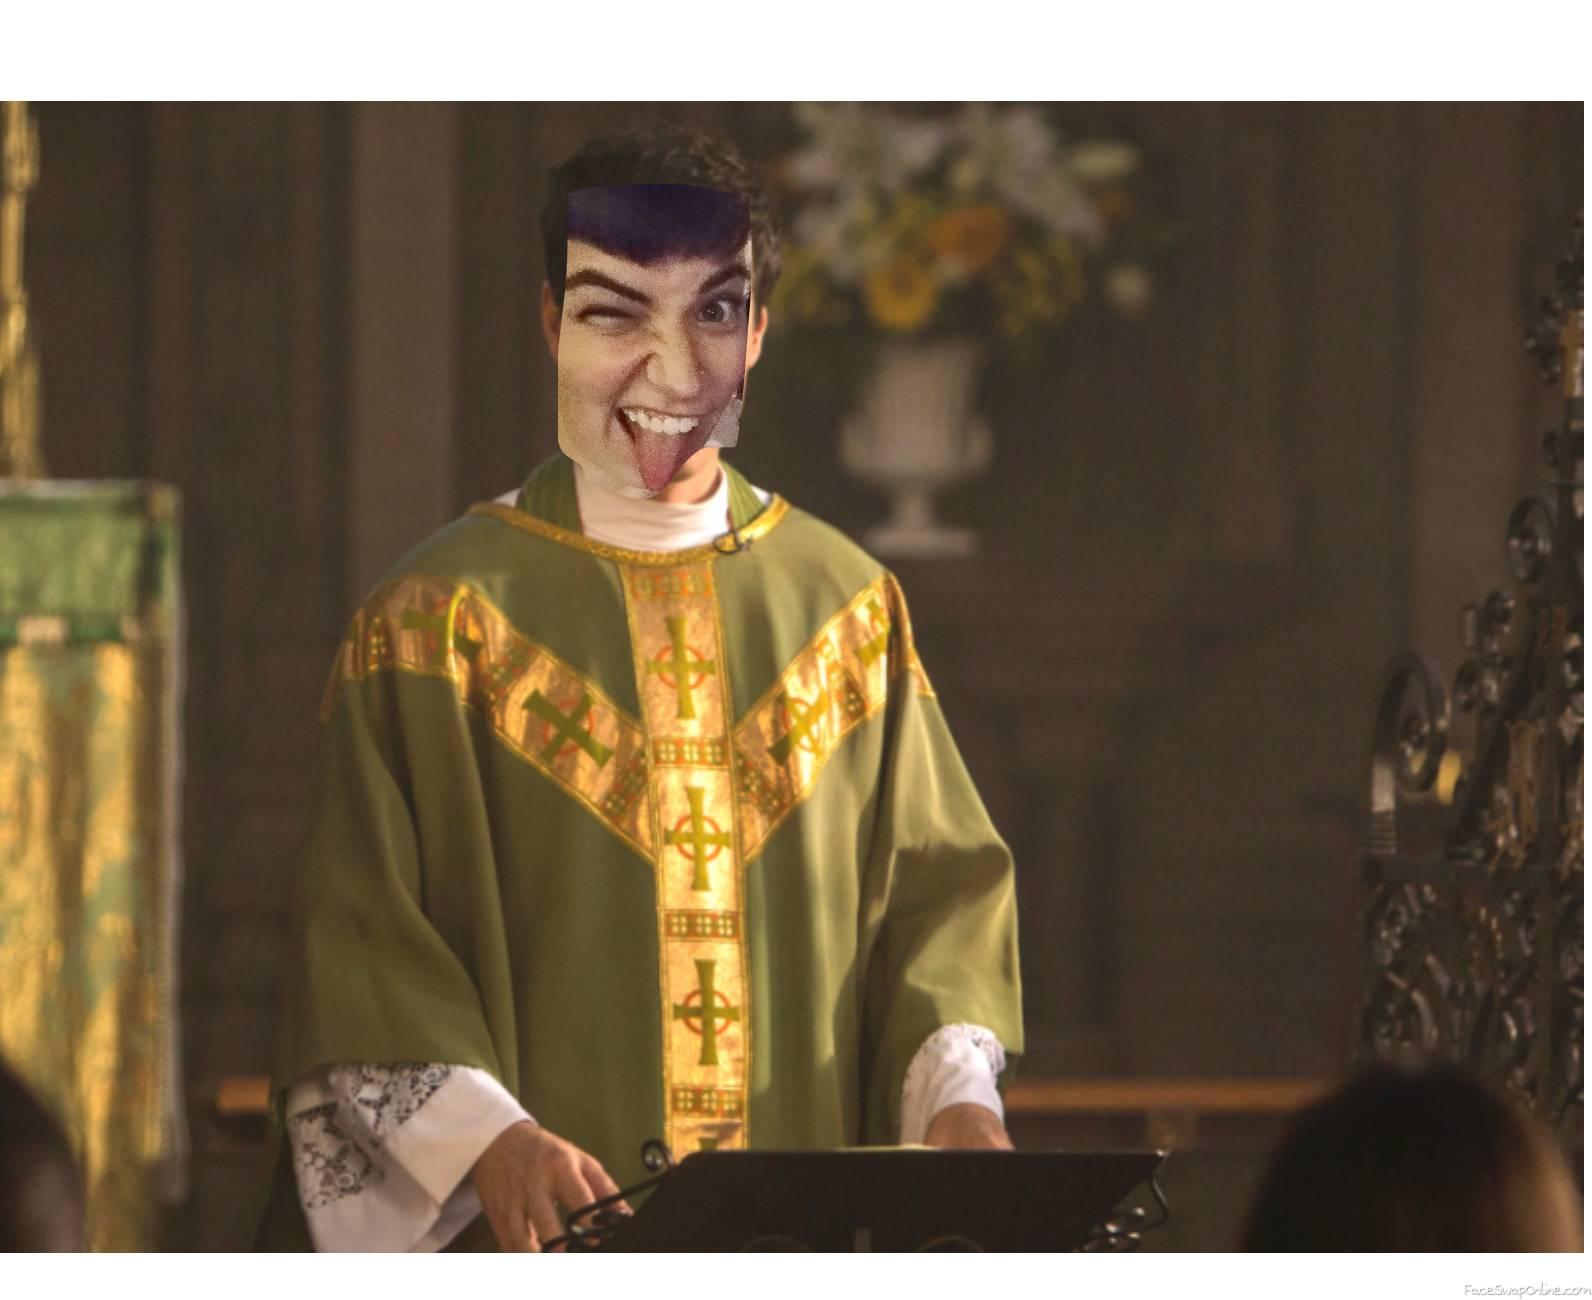 hot priest